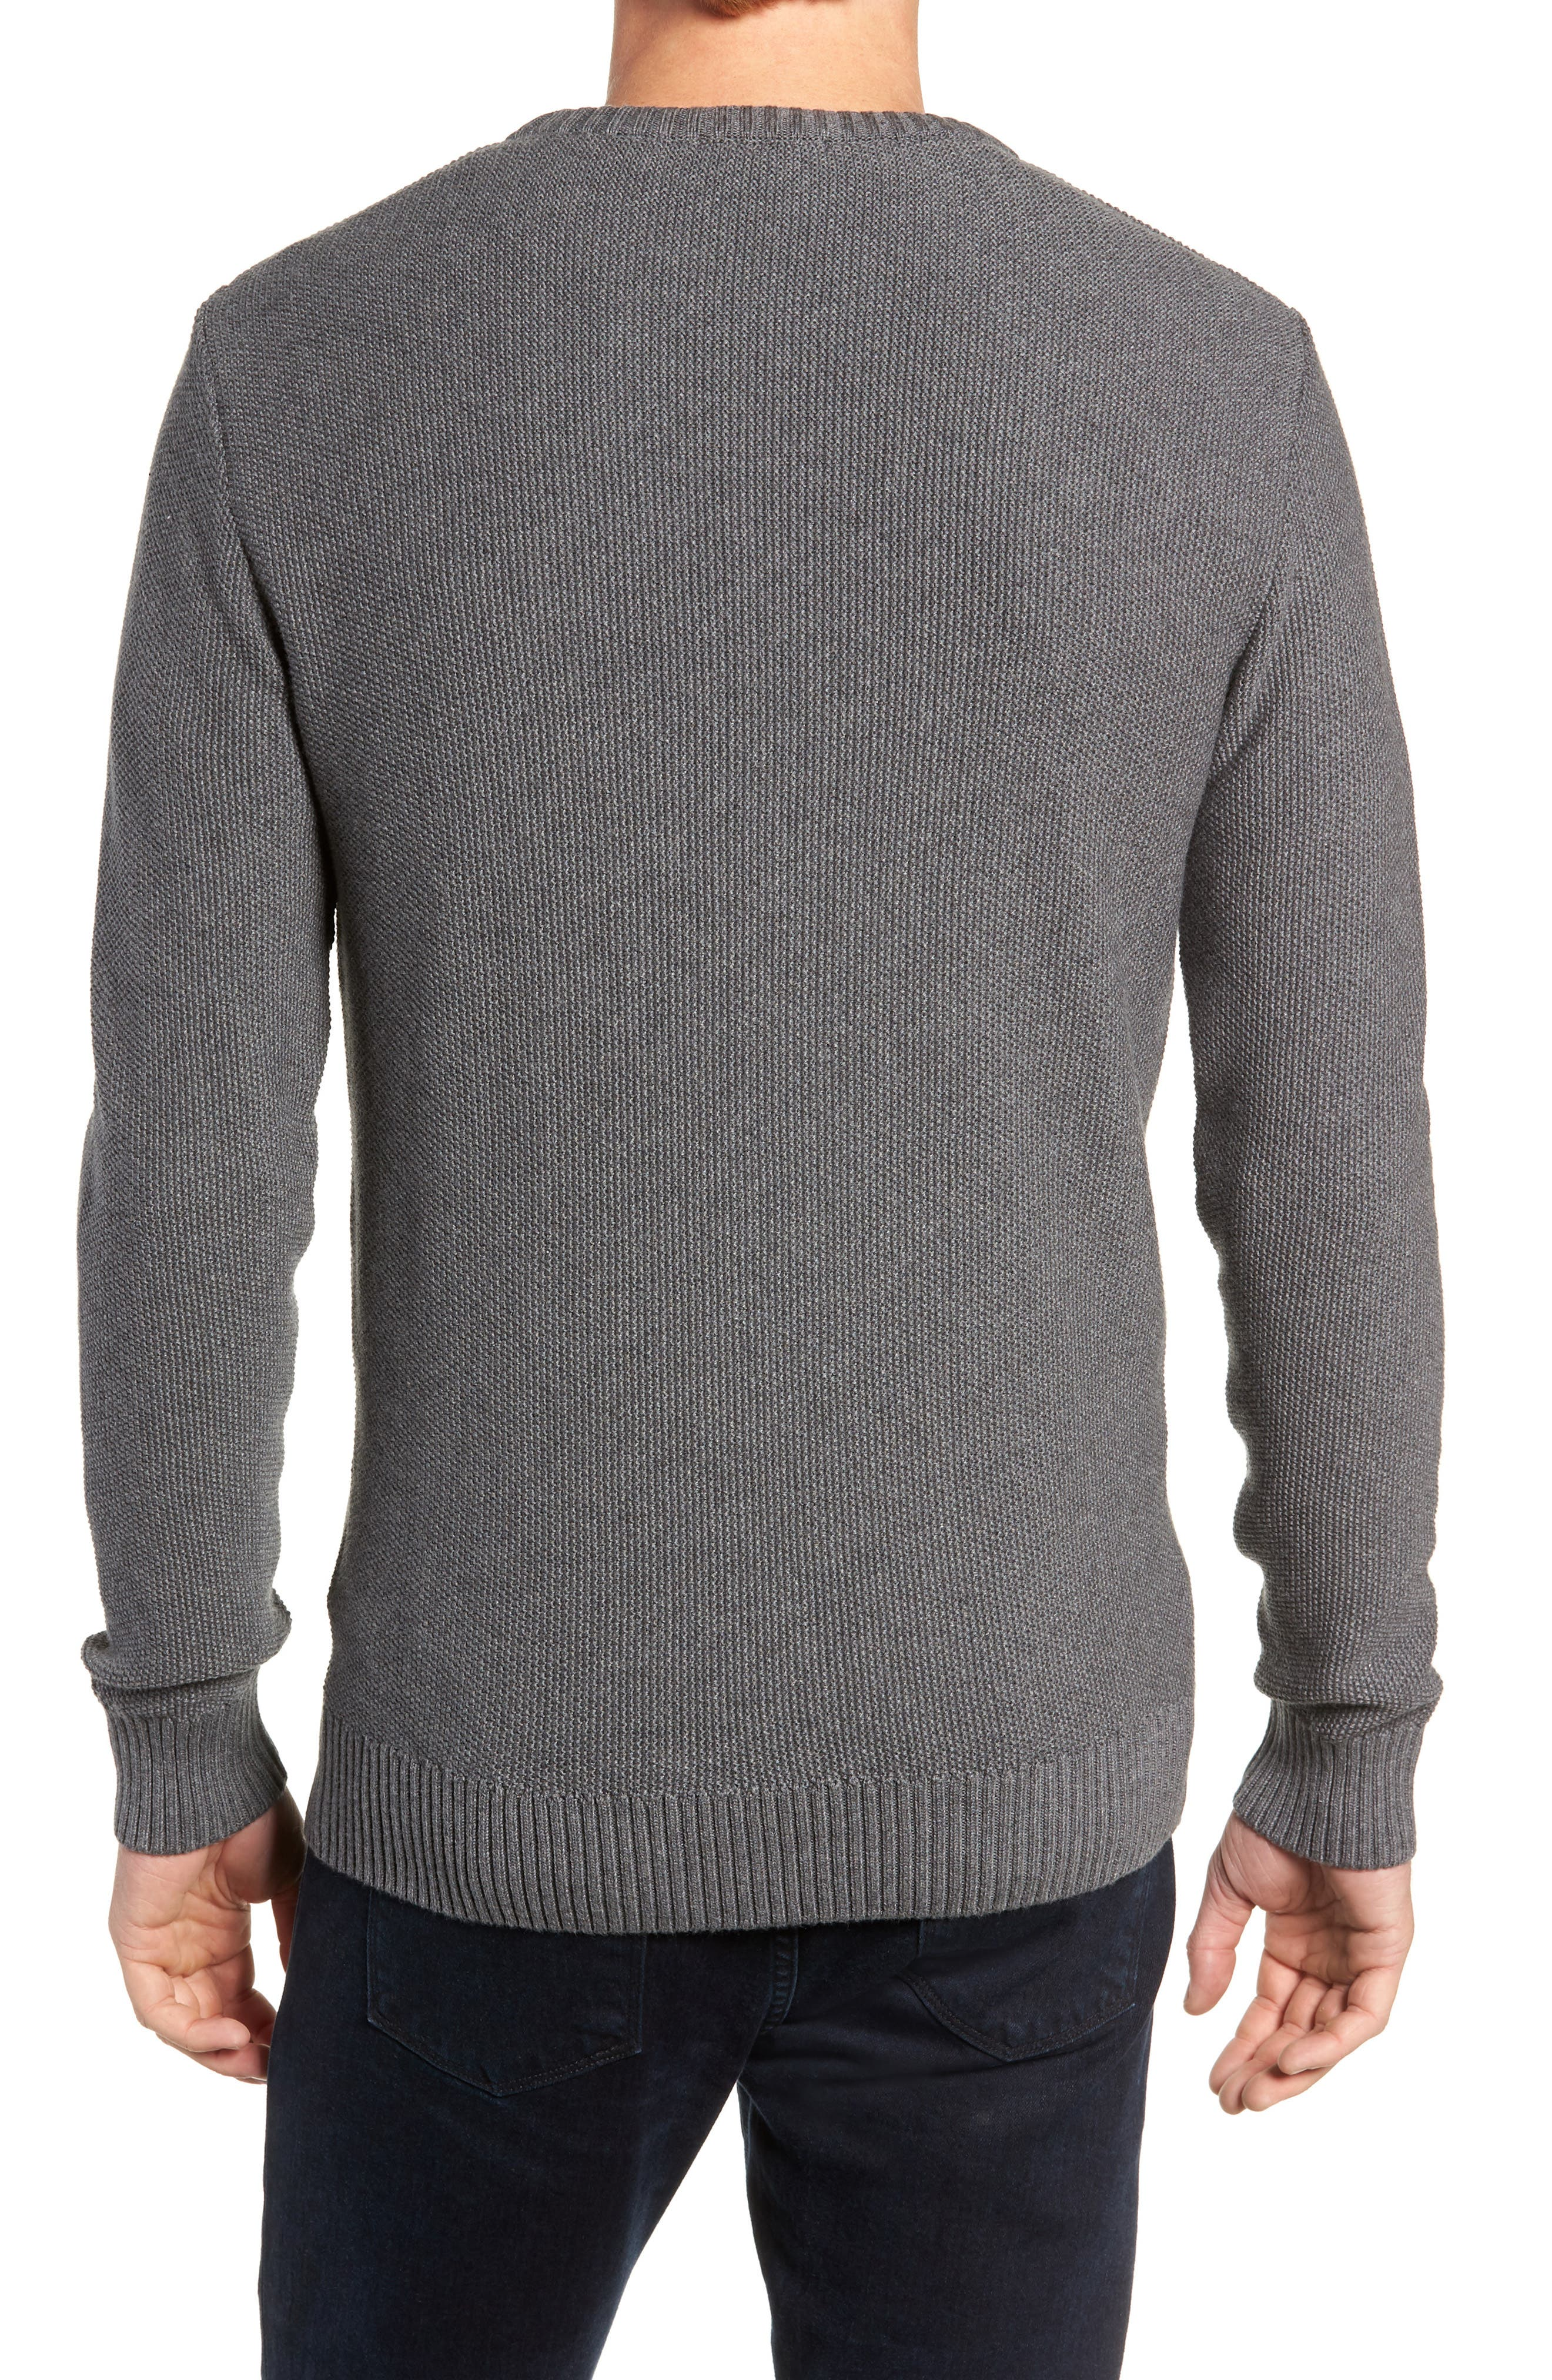 Owl Textured Sweater,                             Alternate thumbnail 2, color,                             GREY MELANGE